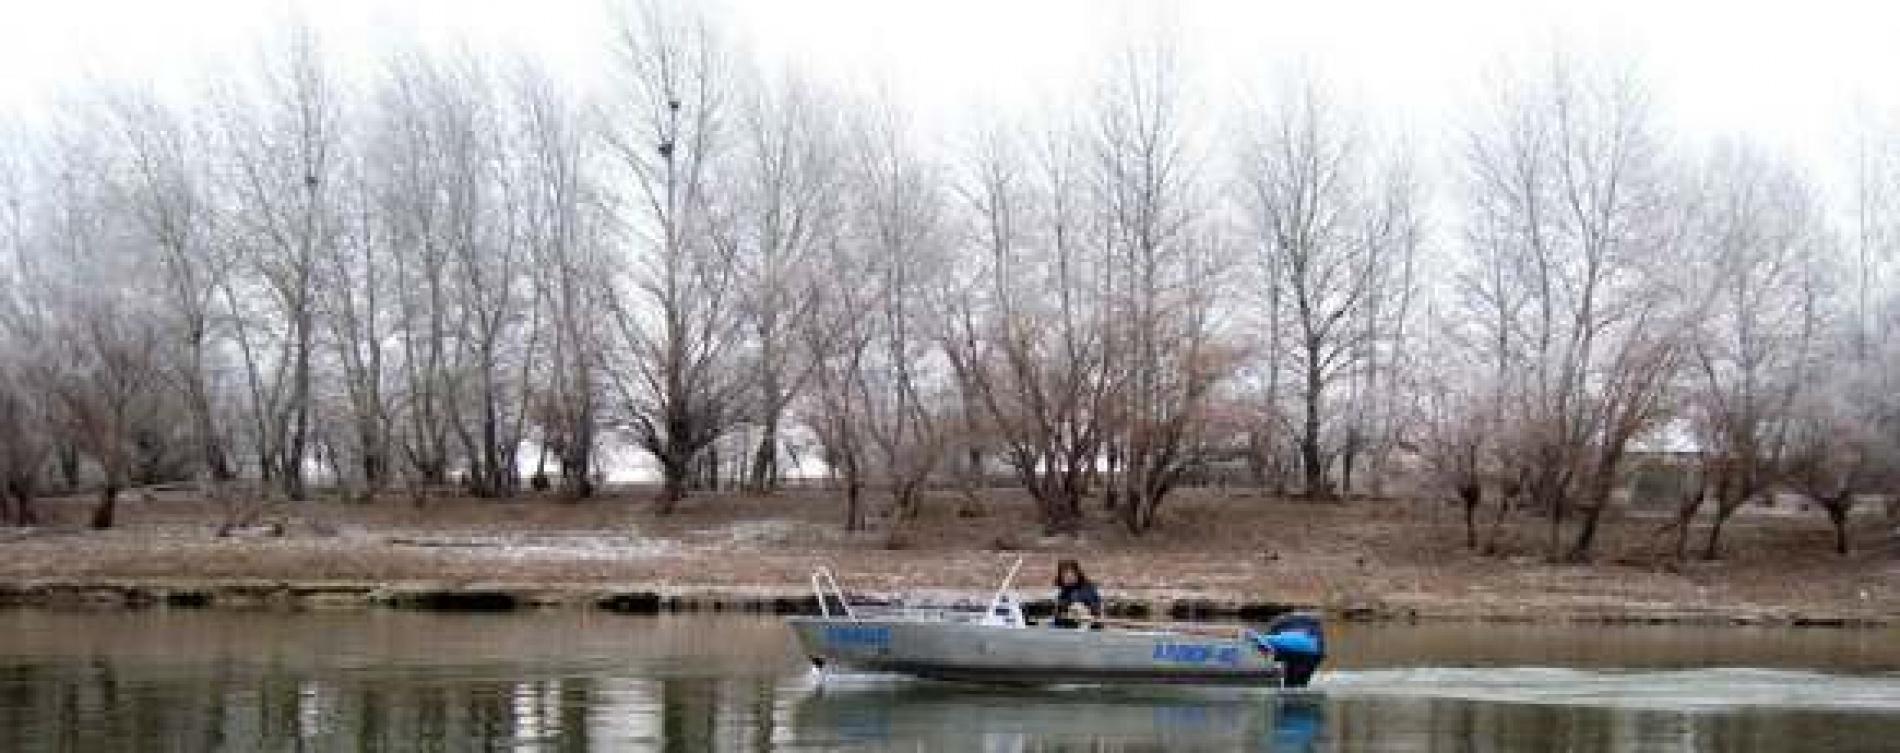 "Рыболовная база ""Пристань рыбака"" Астраханская область, фото 3"